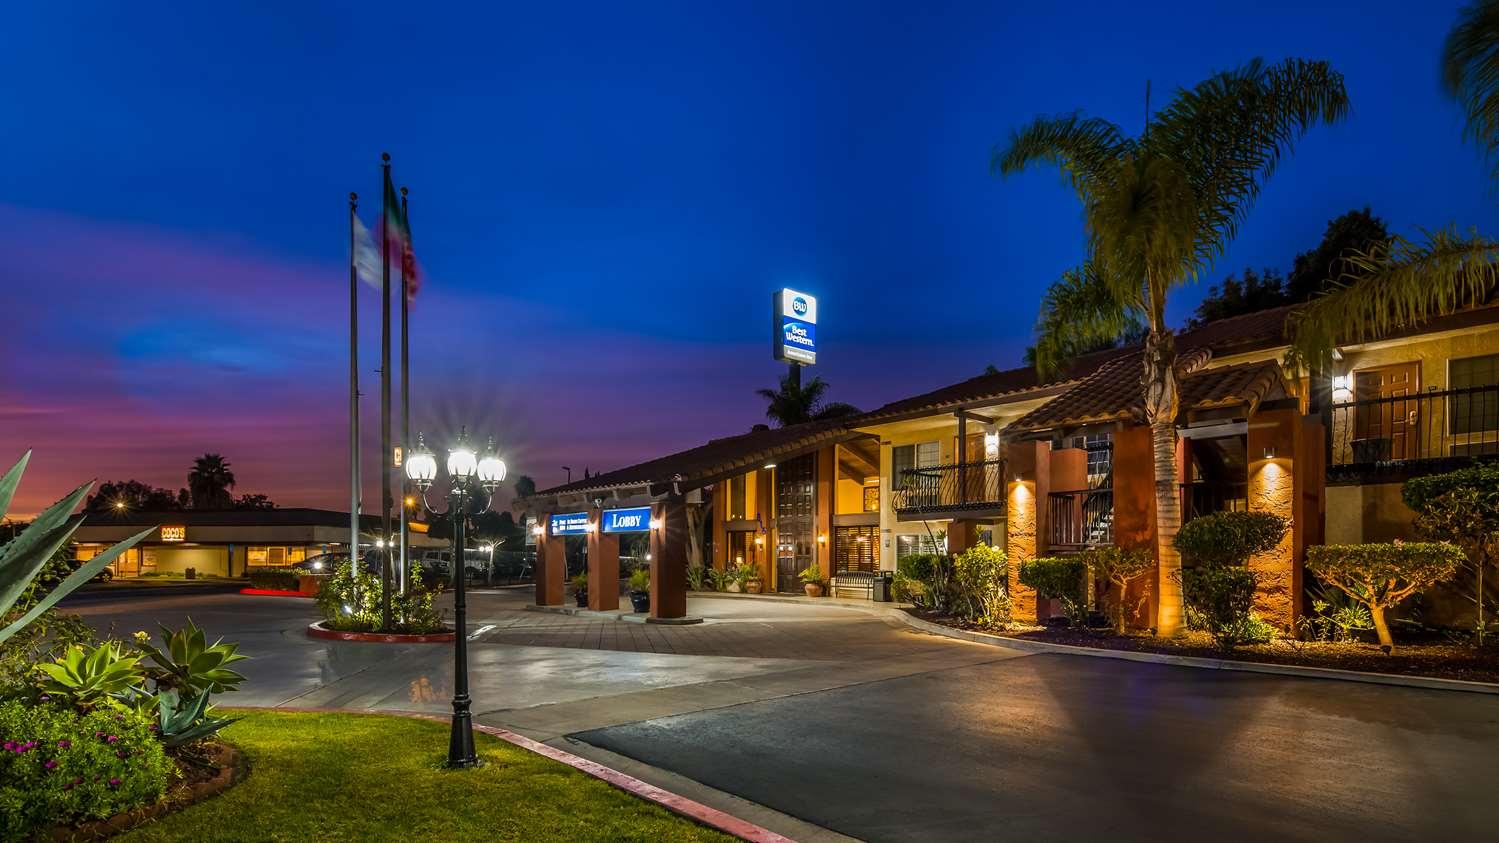 Chula Vista Resort Review Updated Rates Sep 2019: Best Western Americana Inn San Ysidro, CA